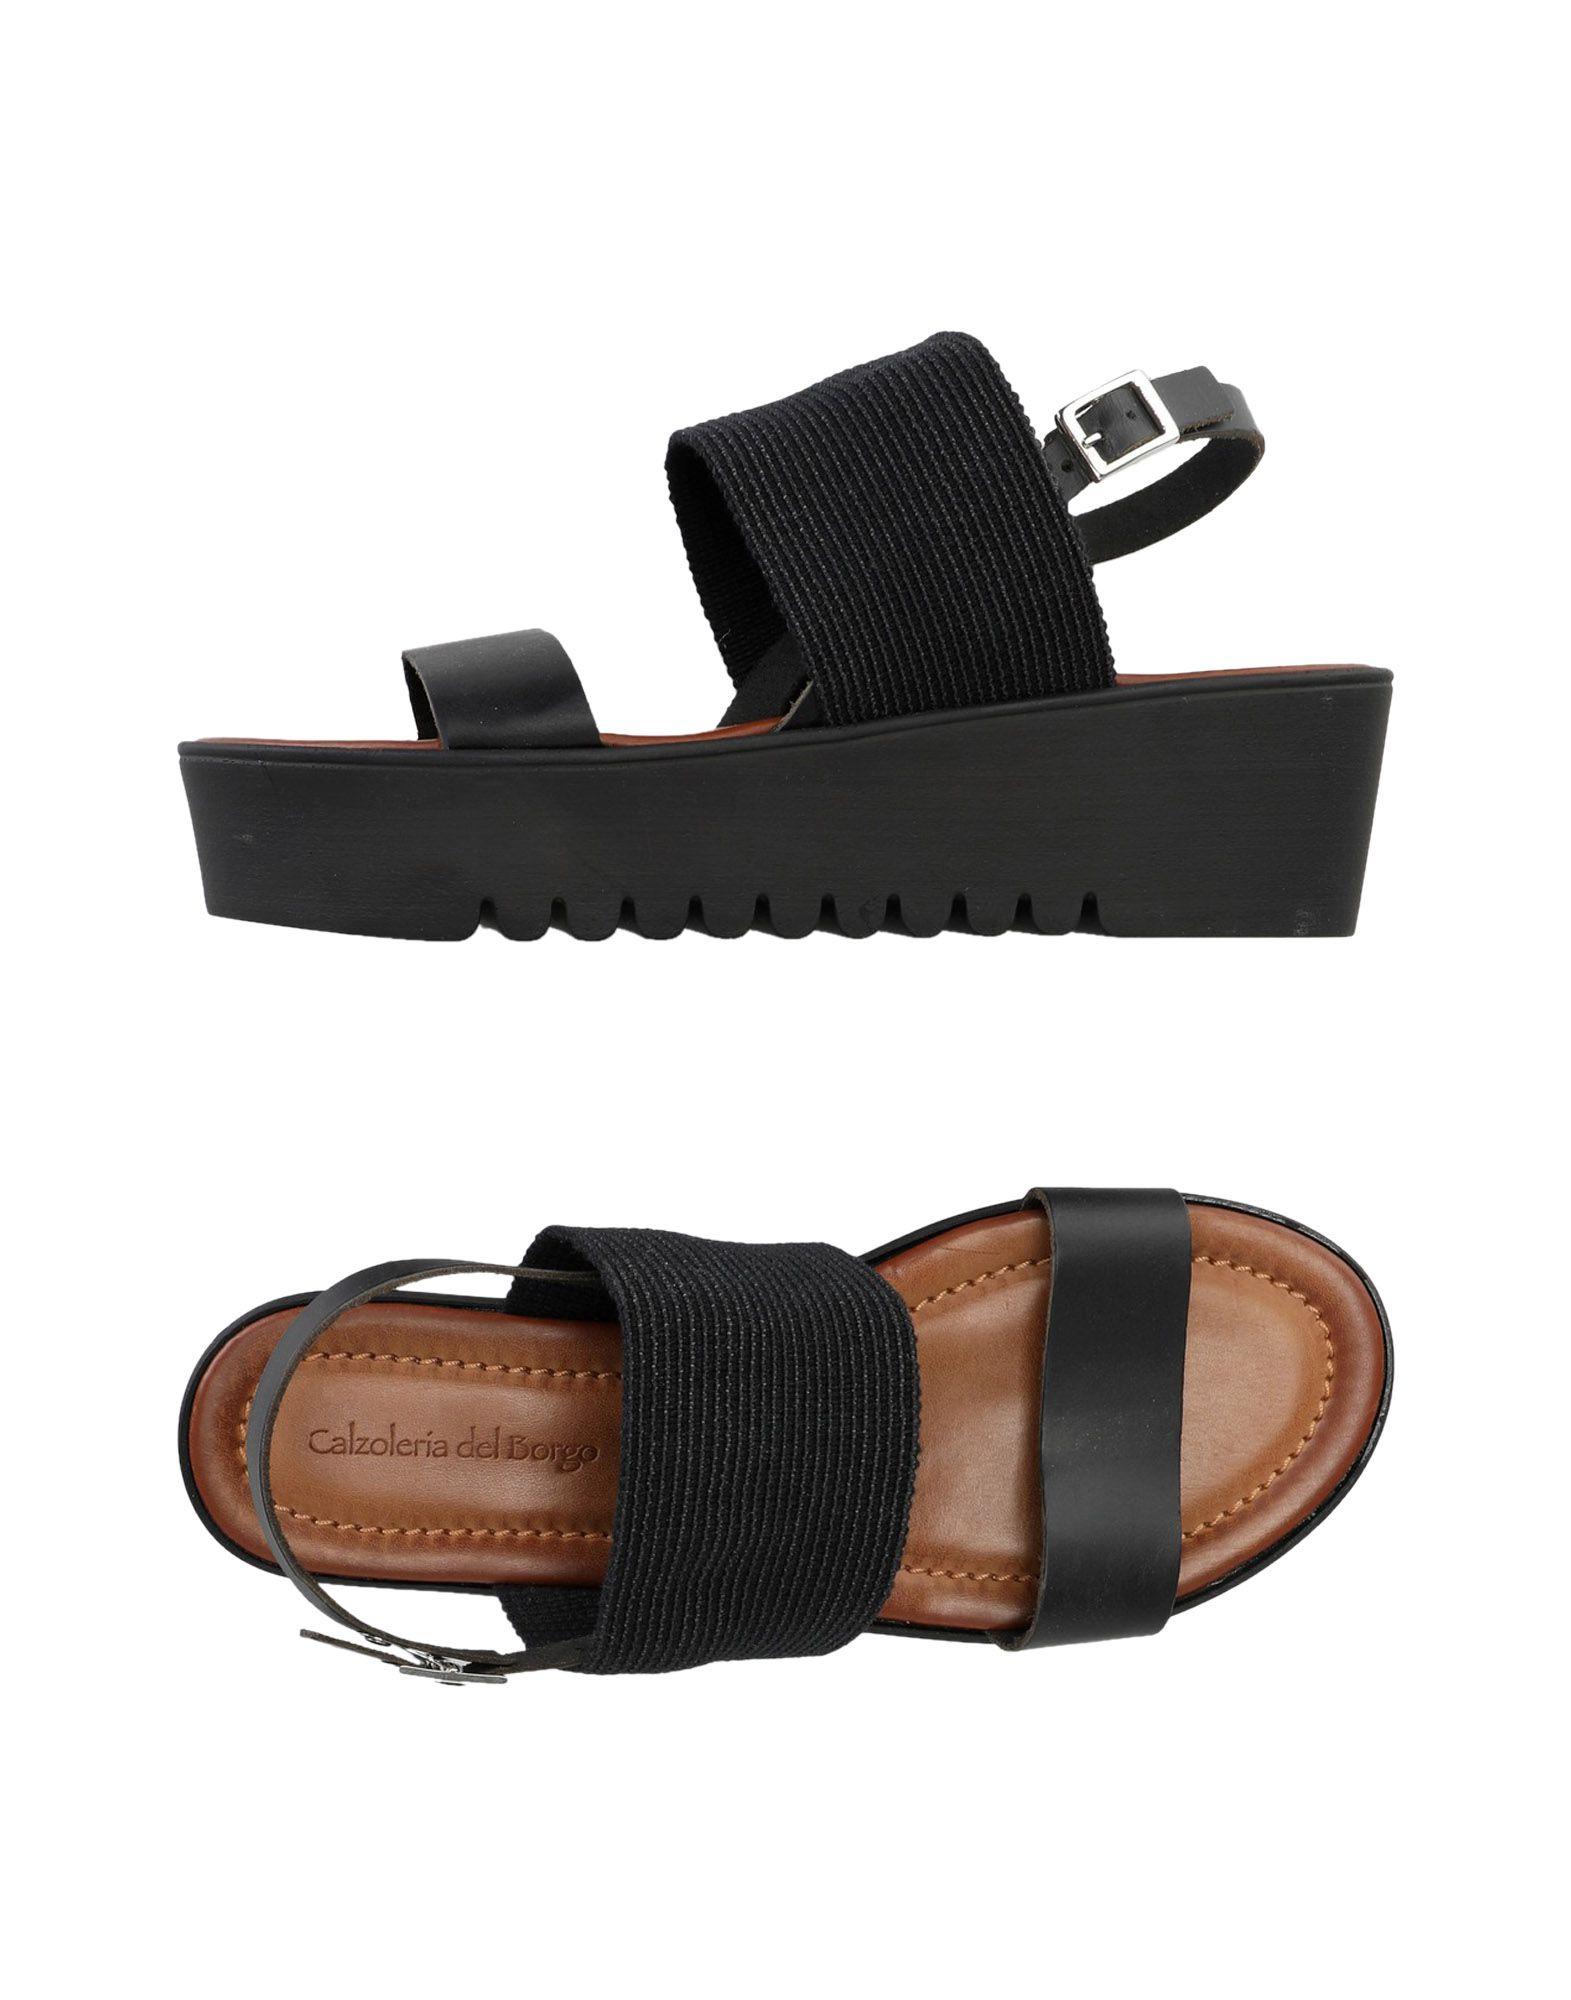 Calzoleria Del Borgo Sandalen Damen  11360280KO Gute Qualität beliebte Schuhe